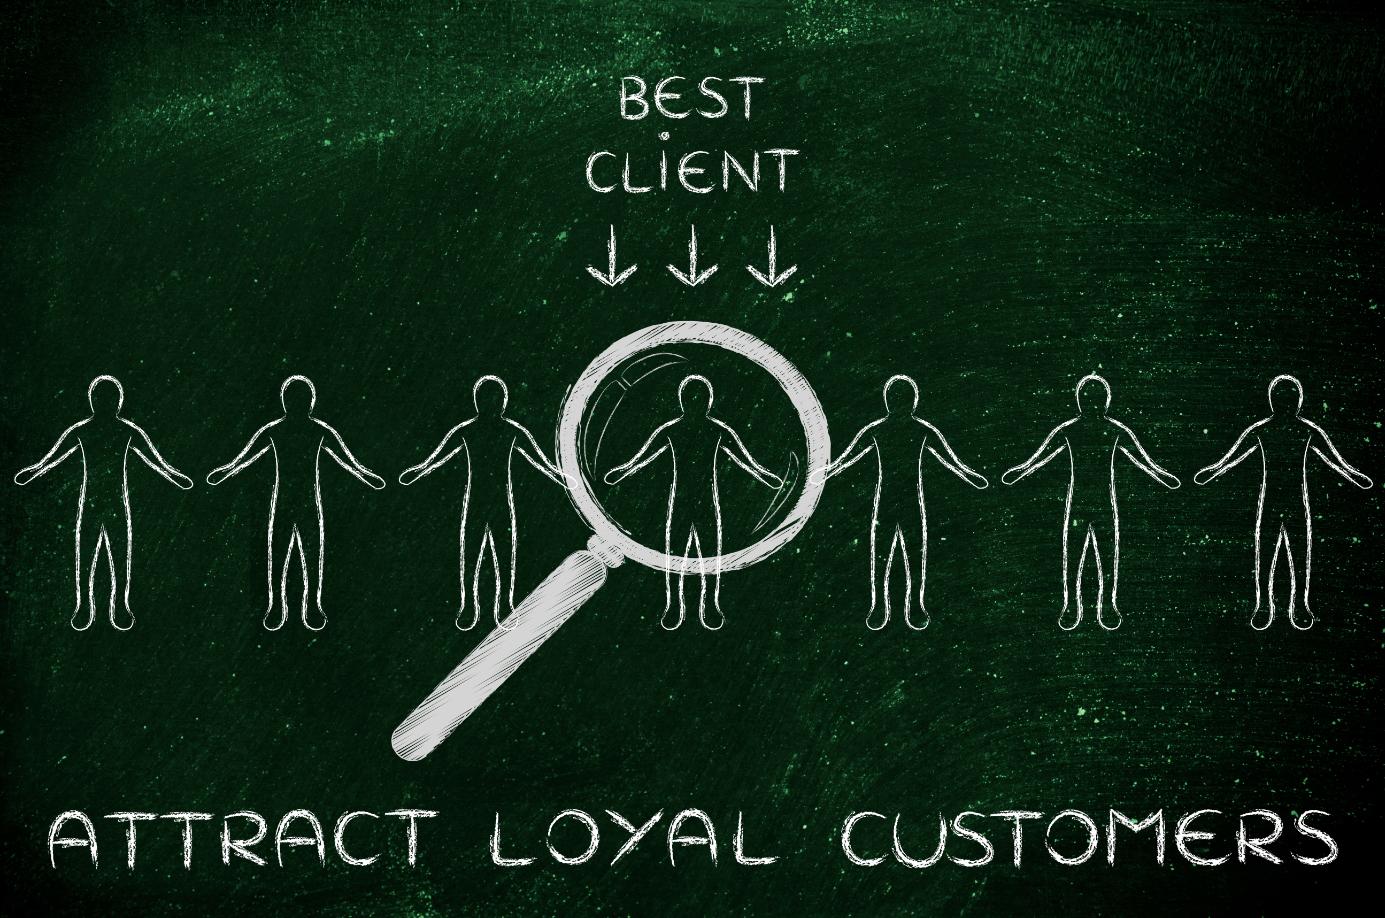 Feedback_customer-retention